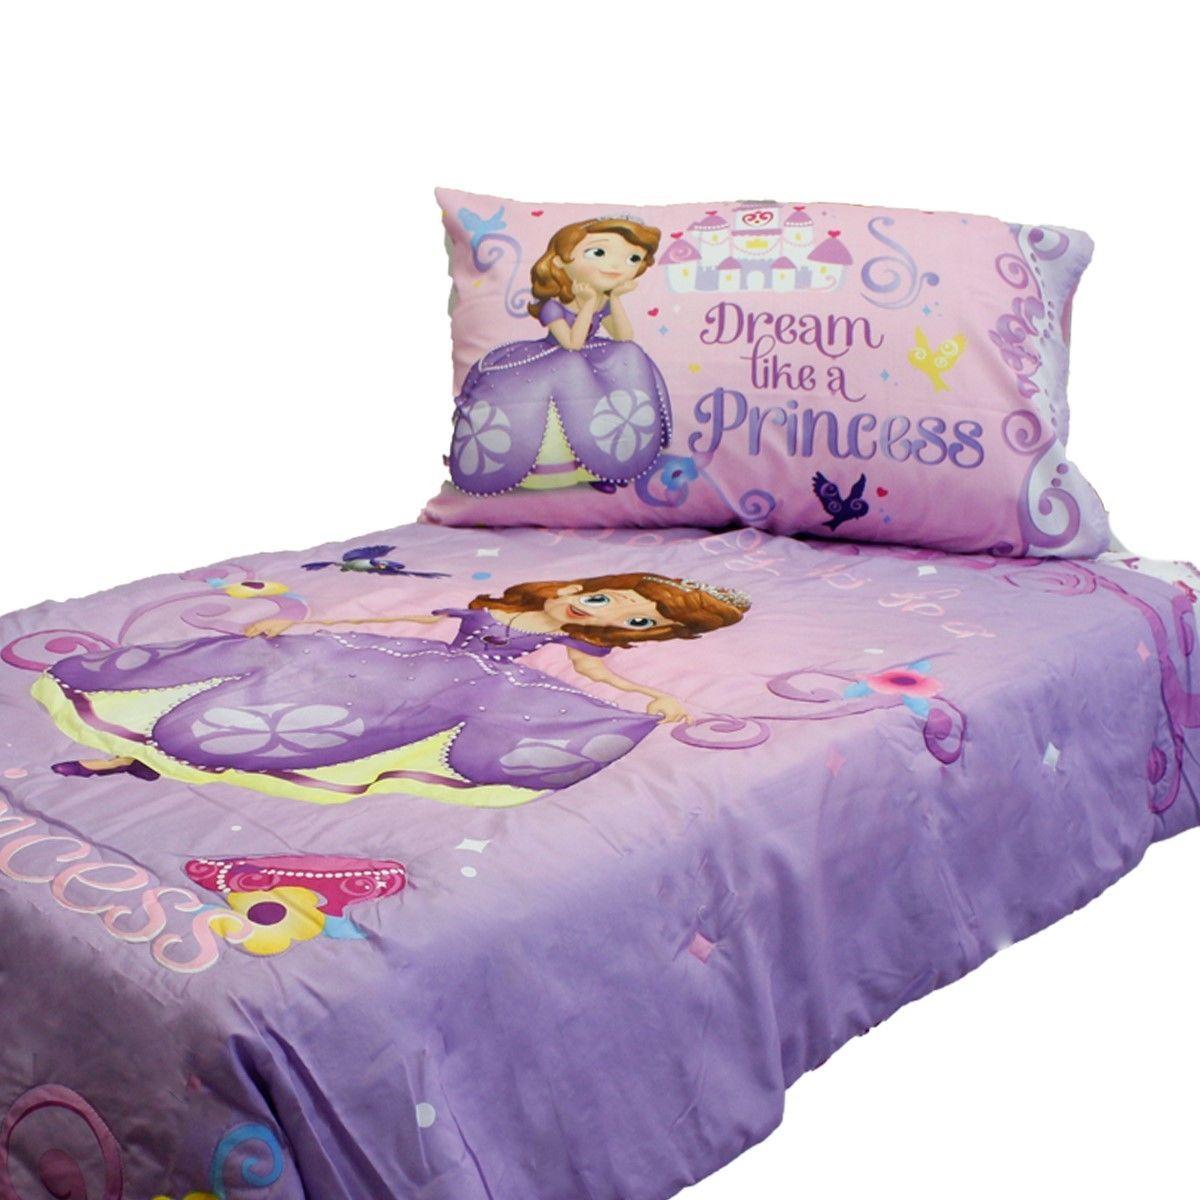 Princess Toddler Bed Comforter